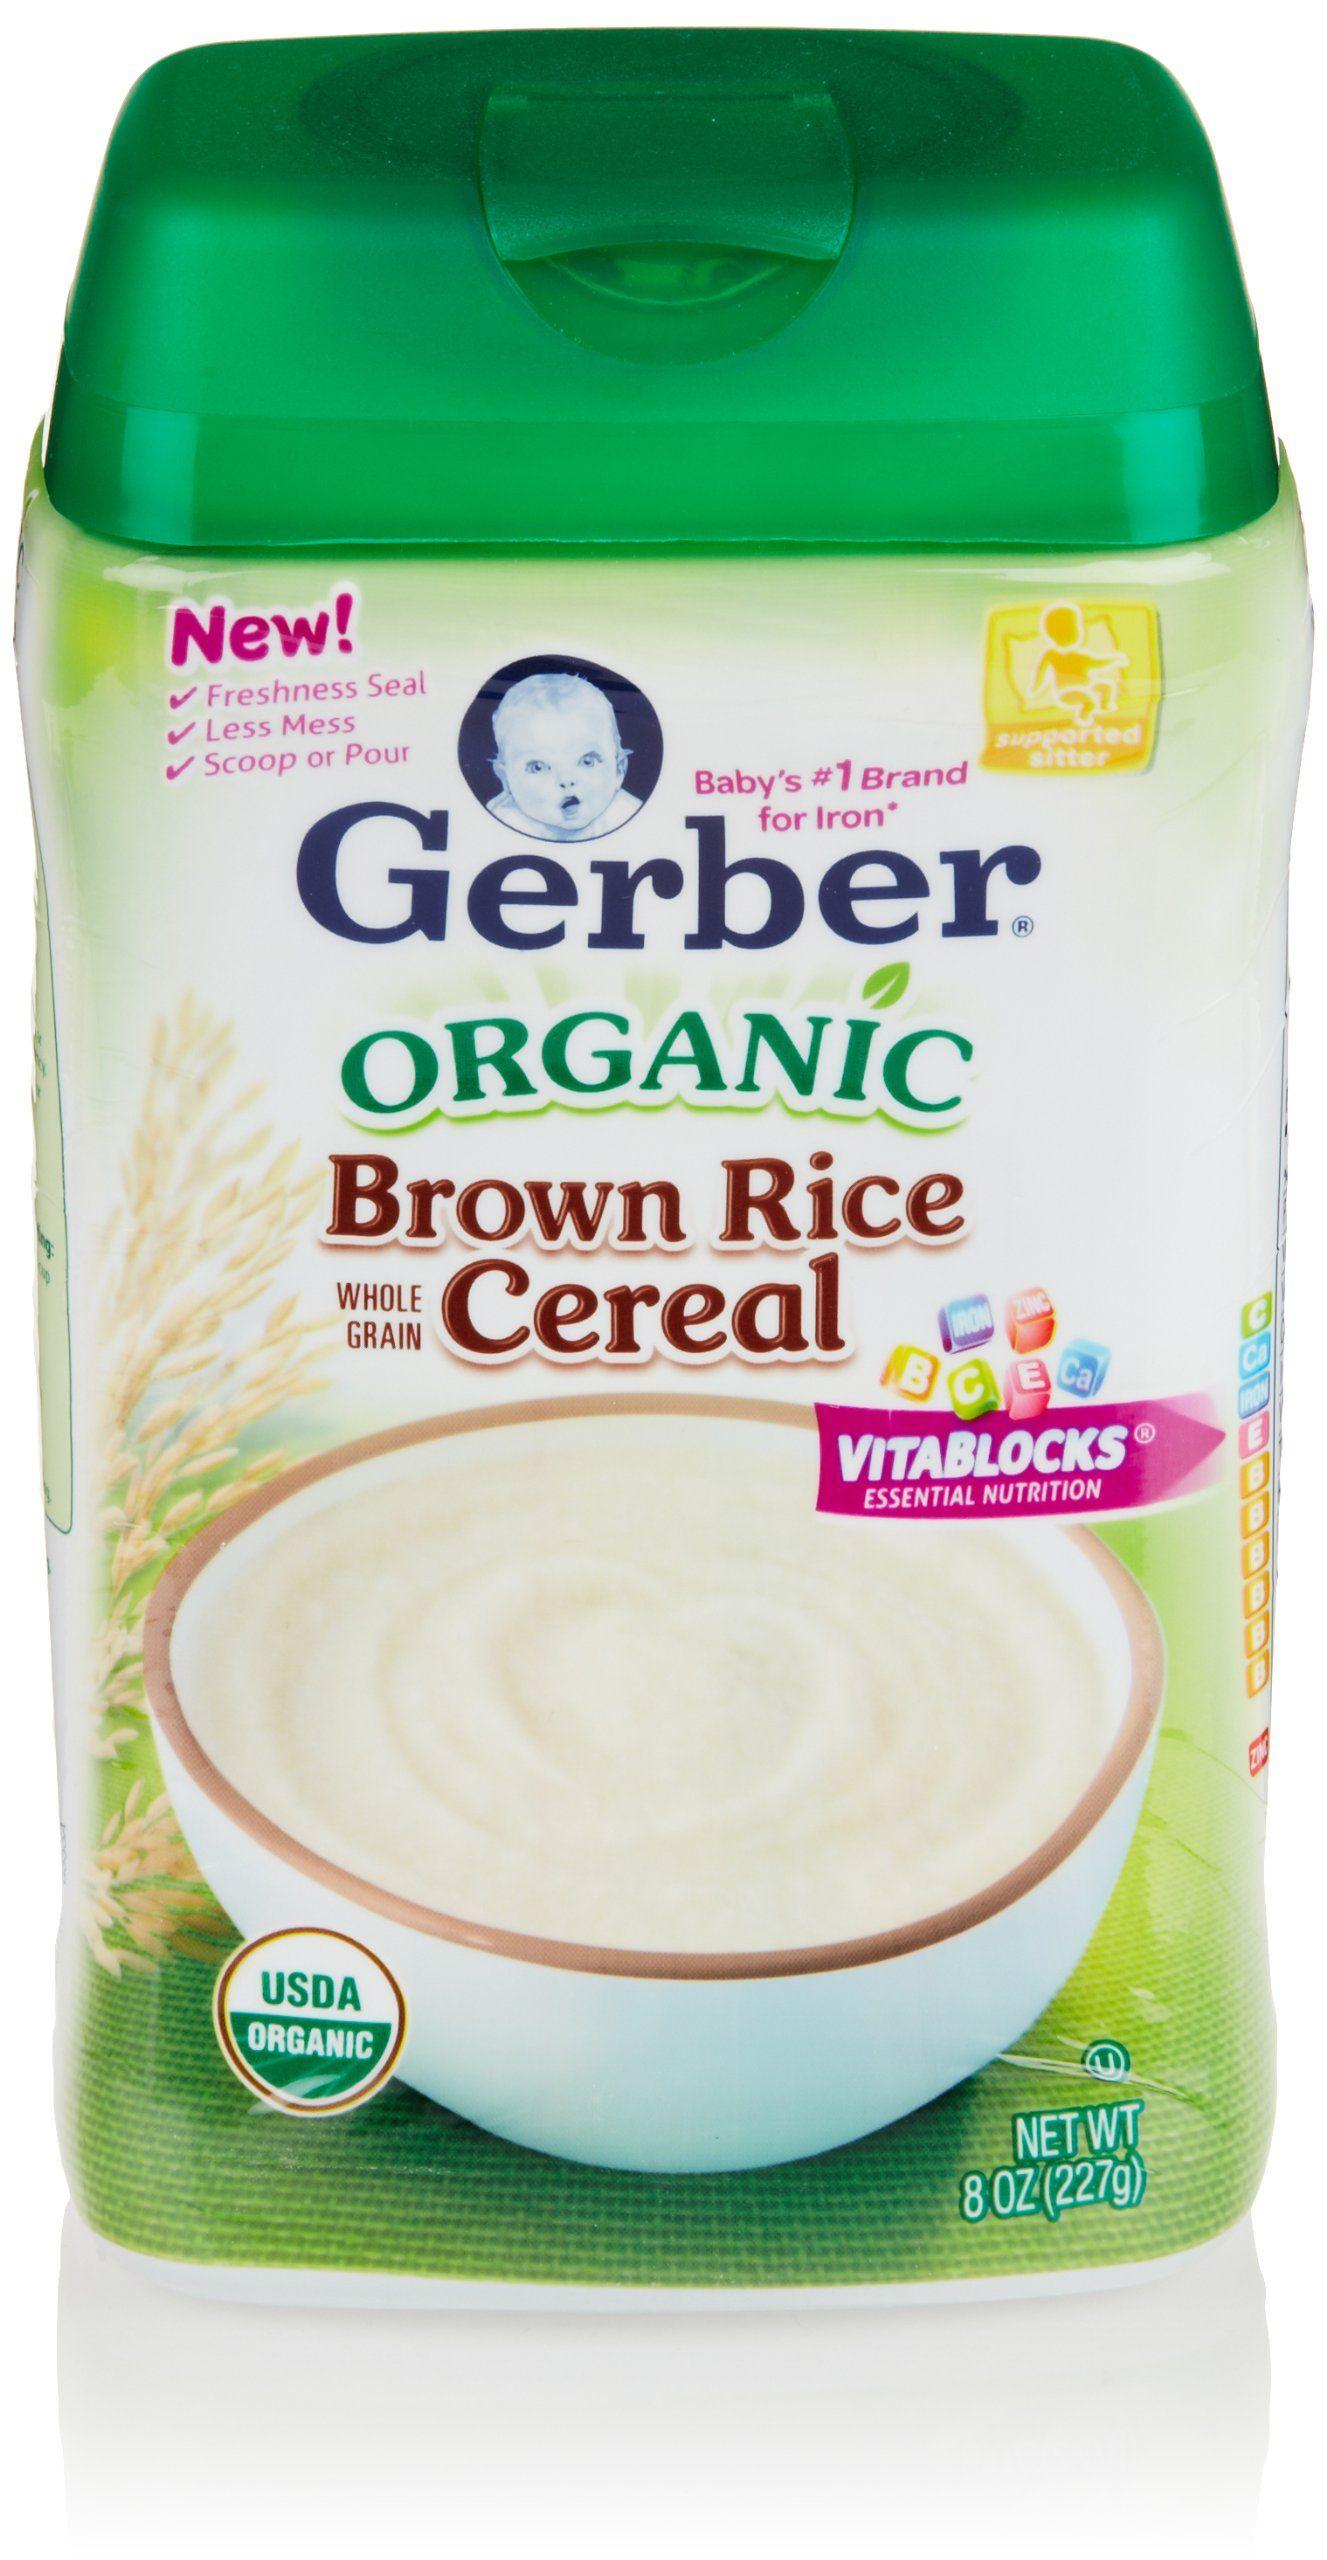 Gerber baby cereal organic brown rice 8 oz